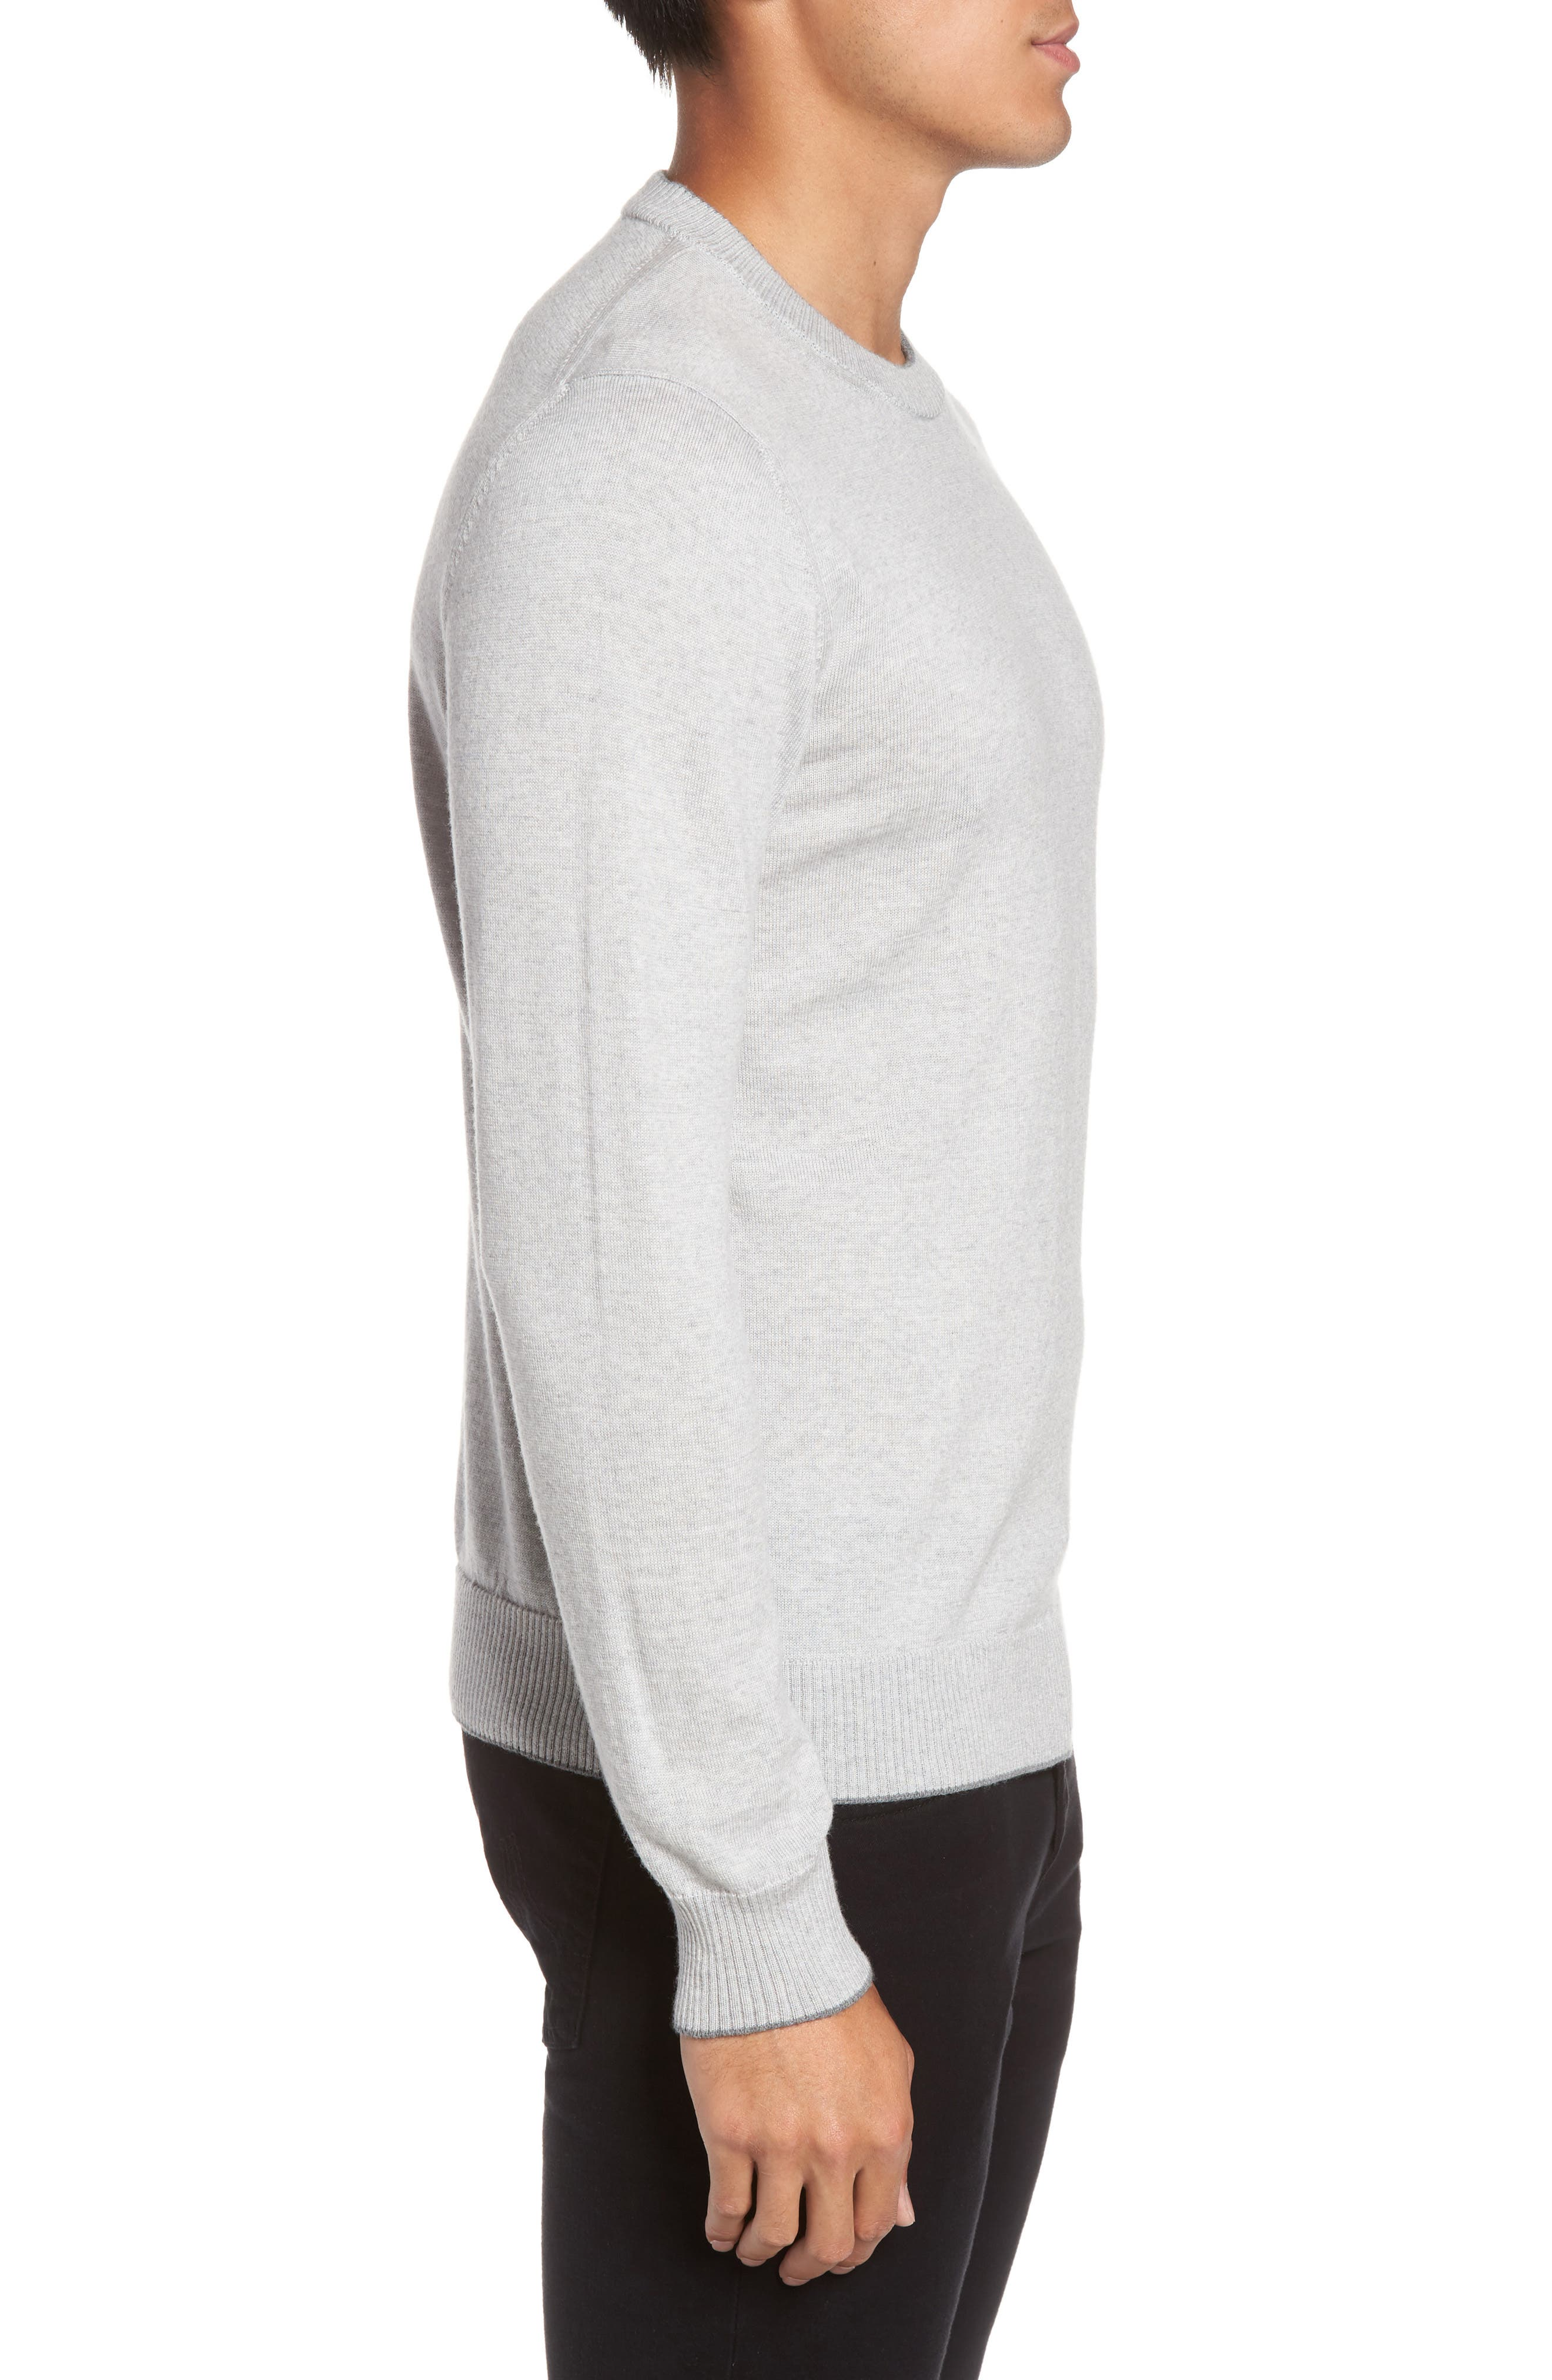 Virgin Wool Crewneck Sweater,                             Alternate thumbnail 3, color,                             Light Grey